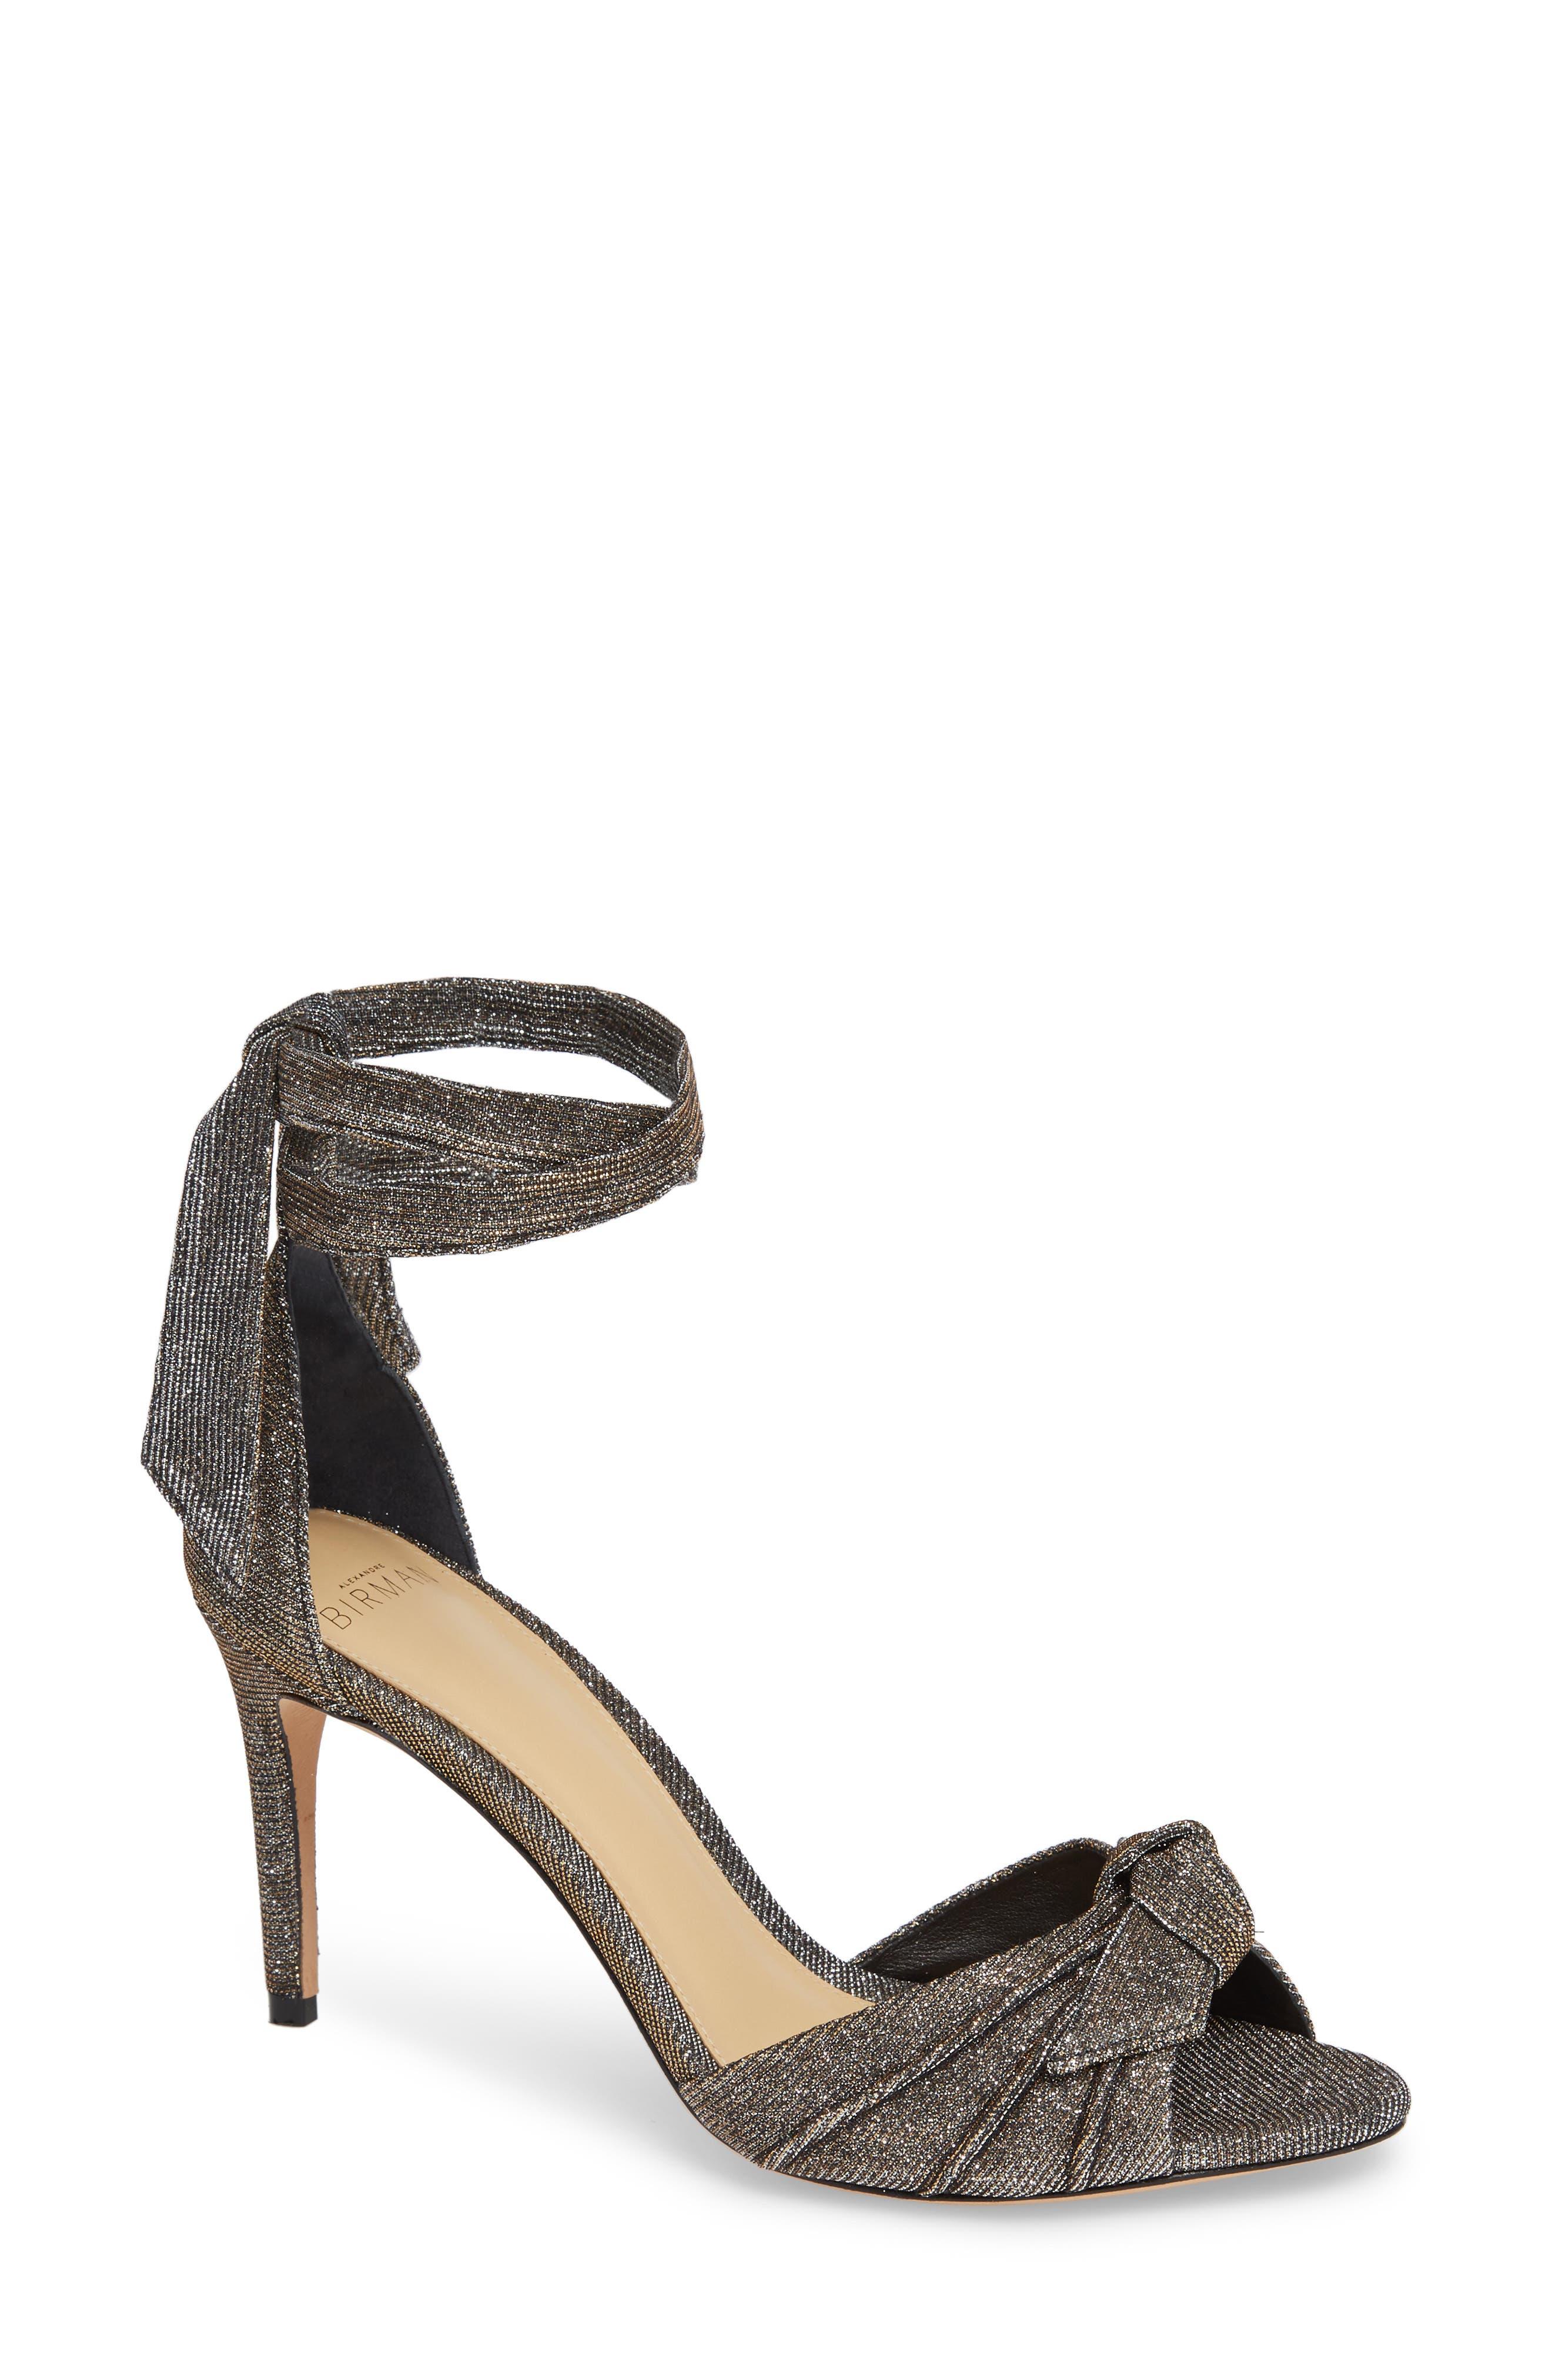 Clarita Ankle Strap Sandal,                         Main,                         color, SILVER